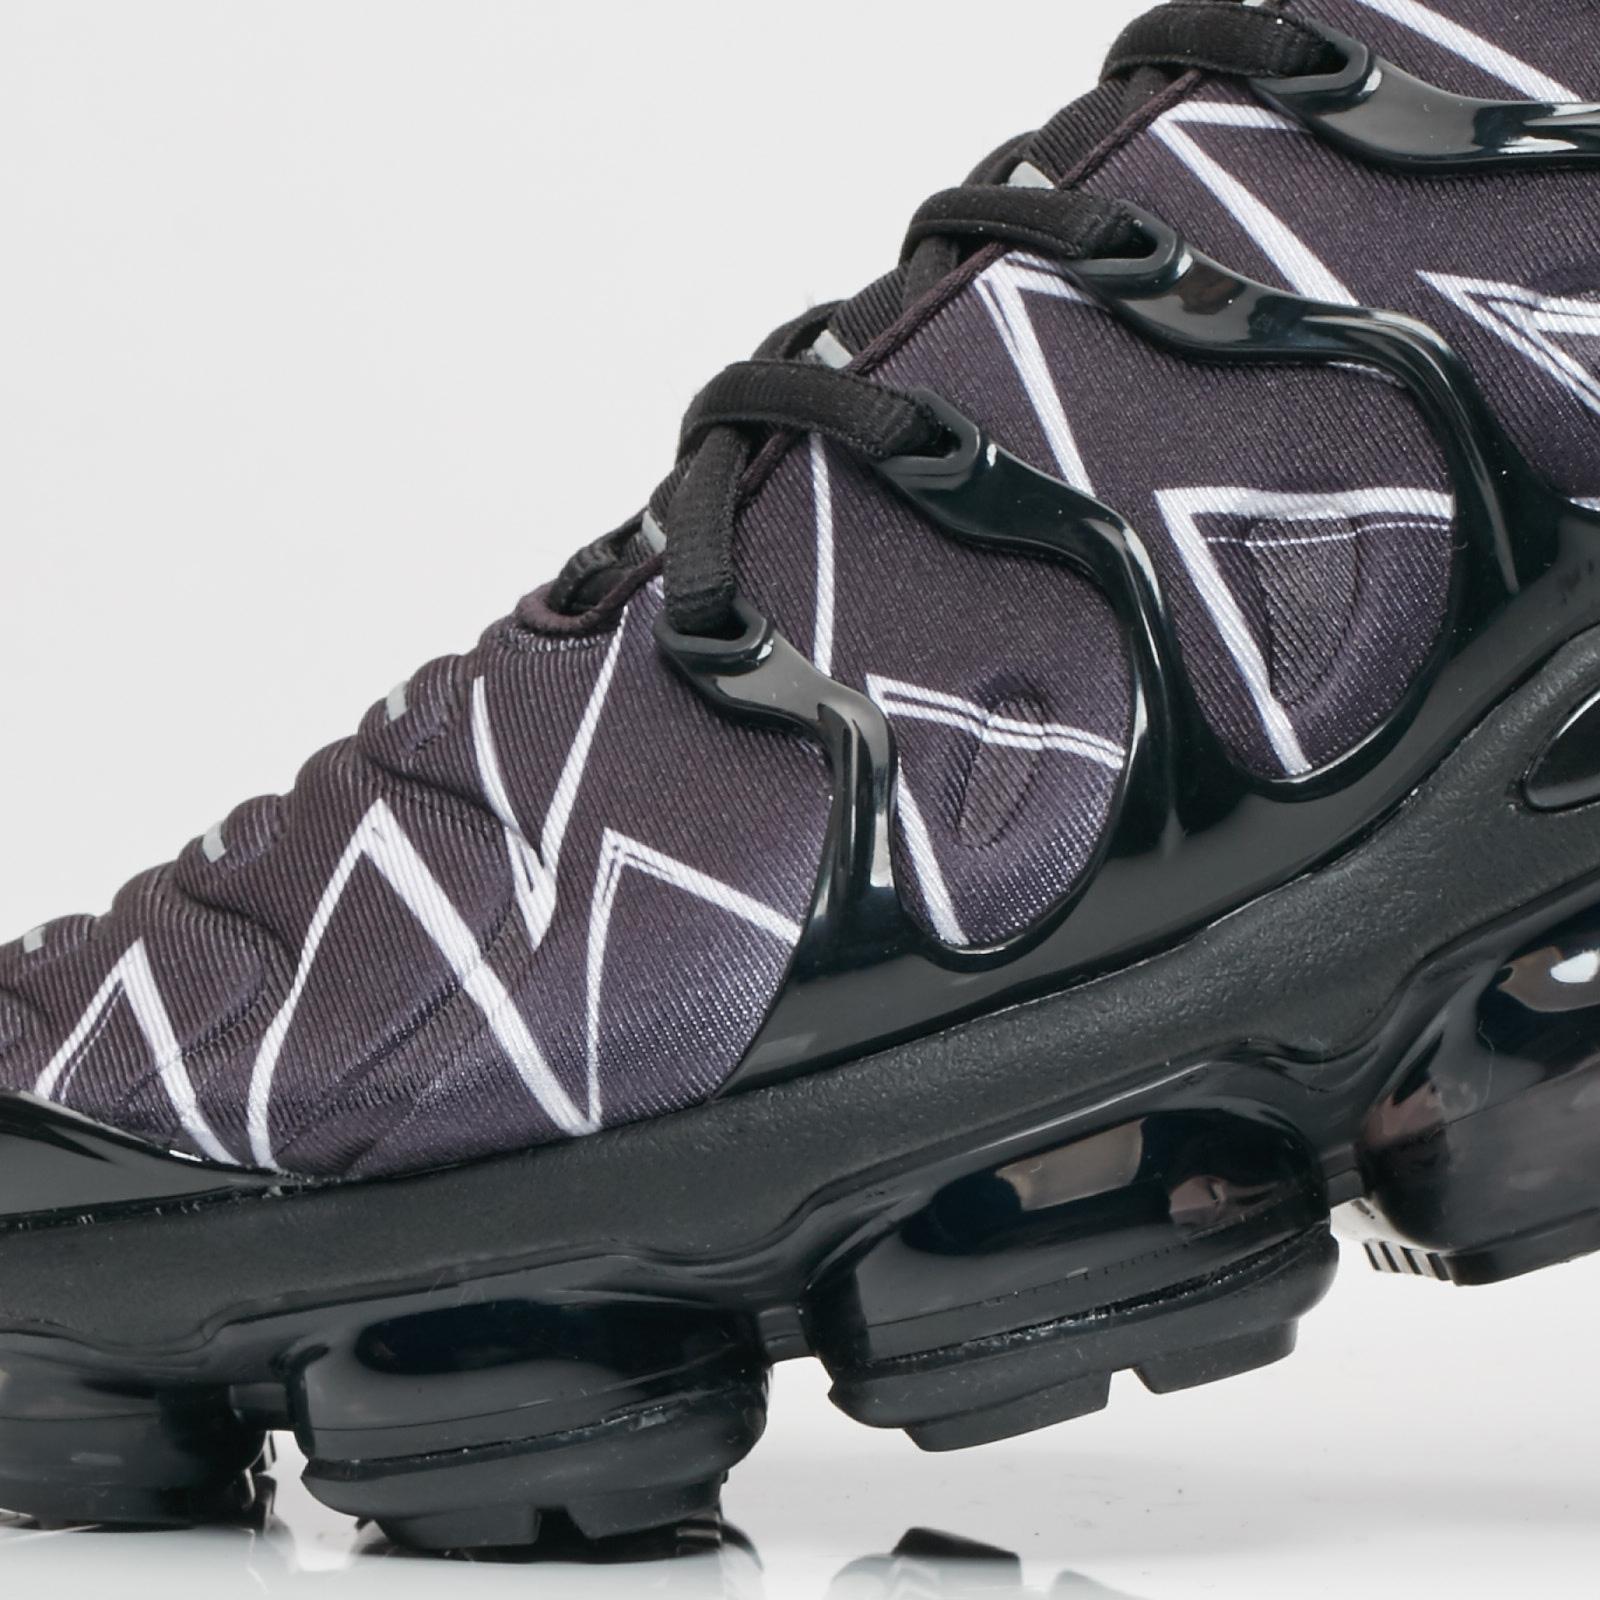 hot sales 6a7a2 c7c0e ... Nike Running Air Vapormax Plus HL ...